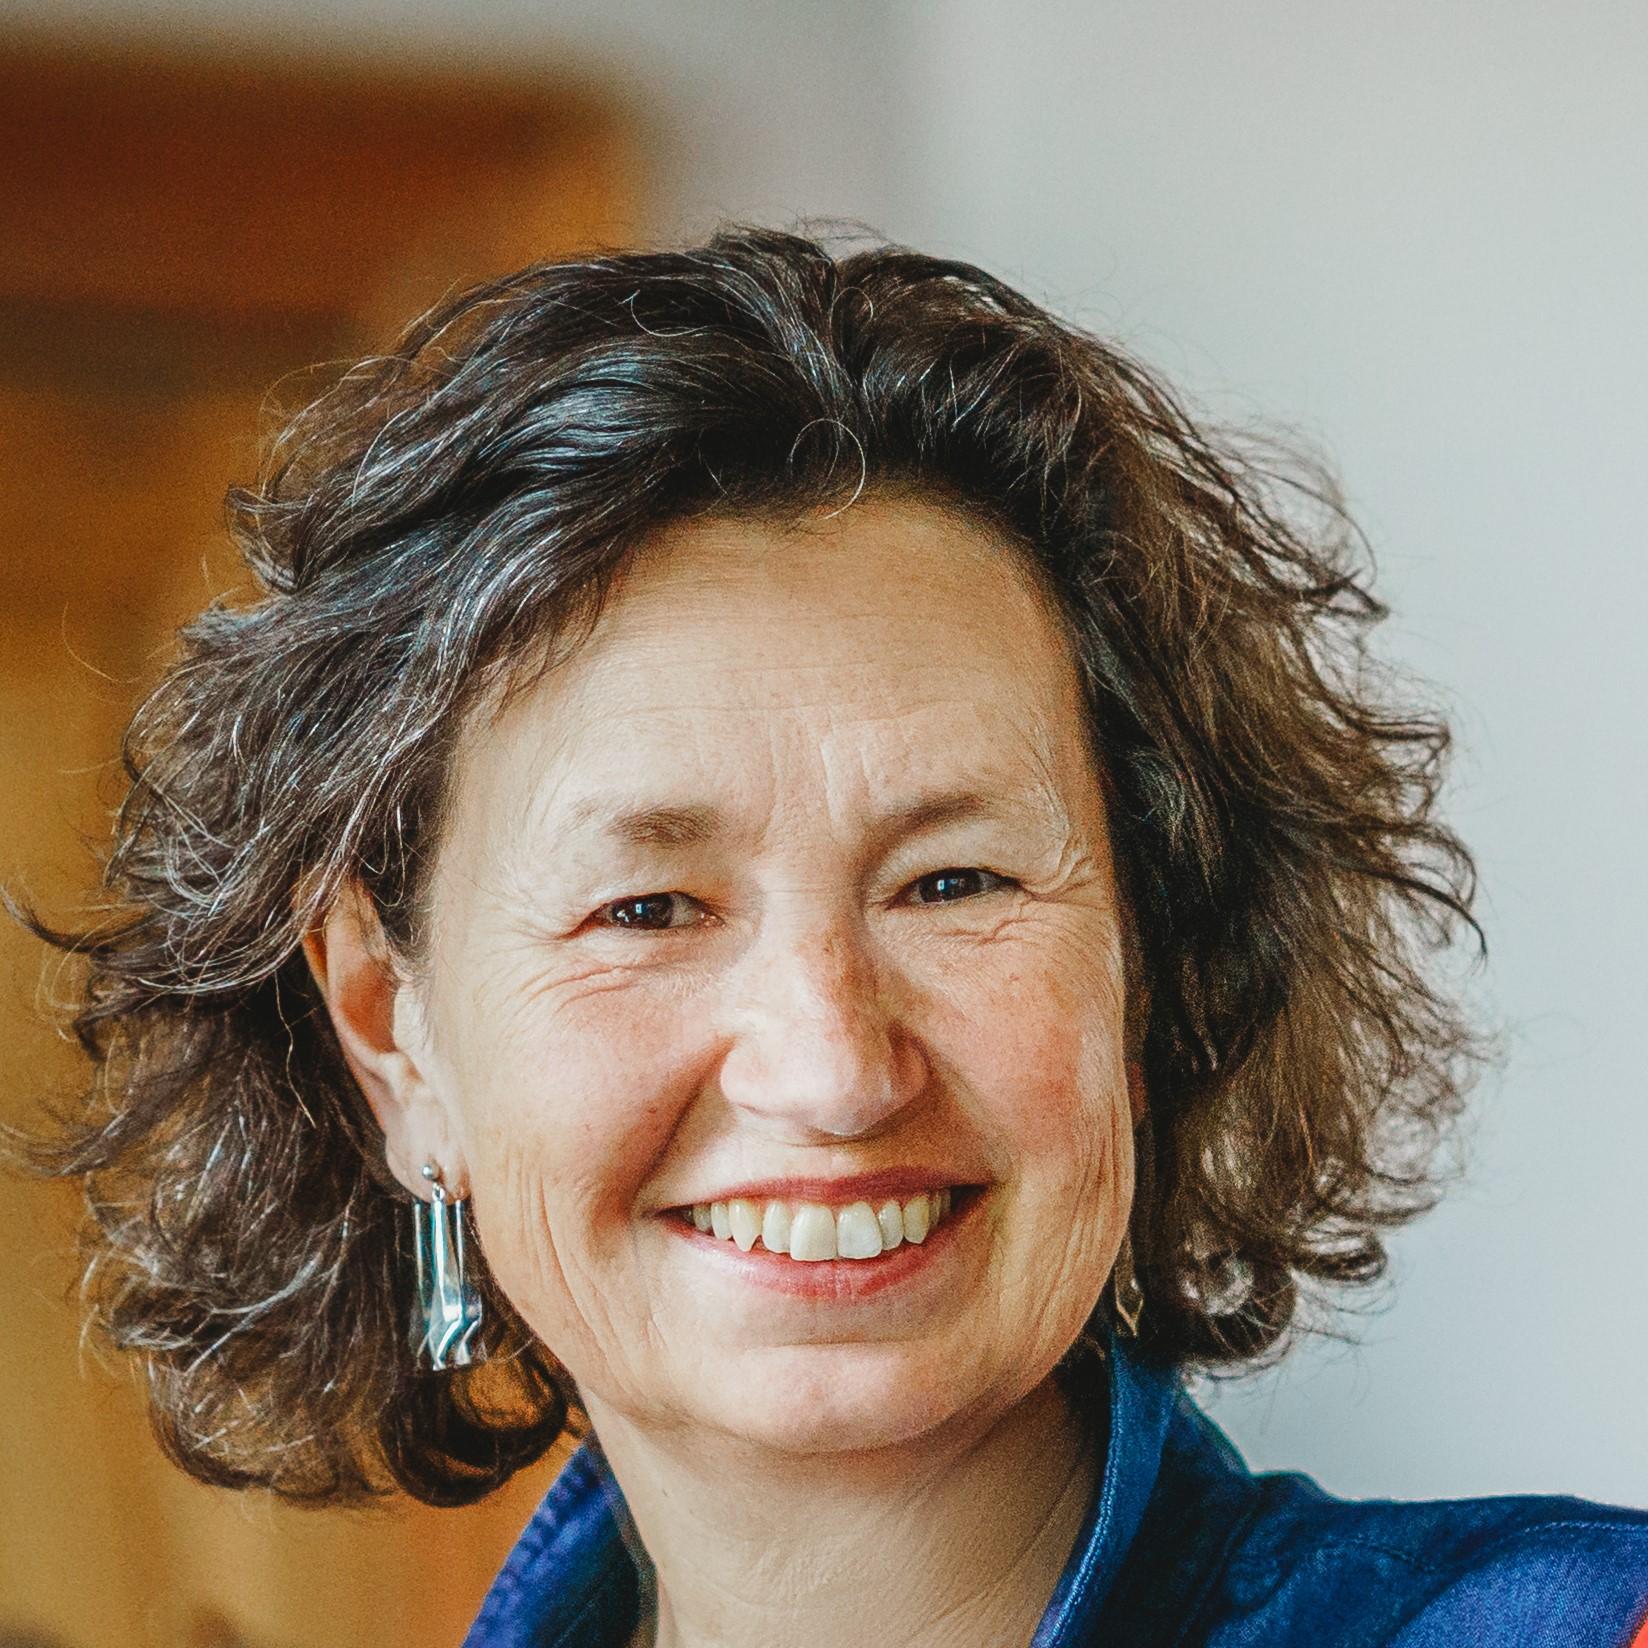 Olga Bosmans